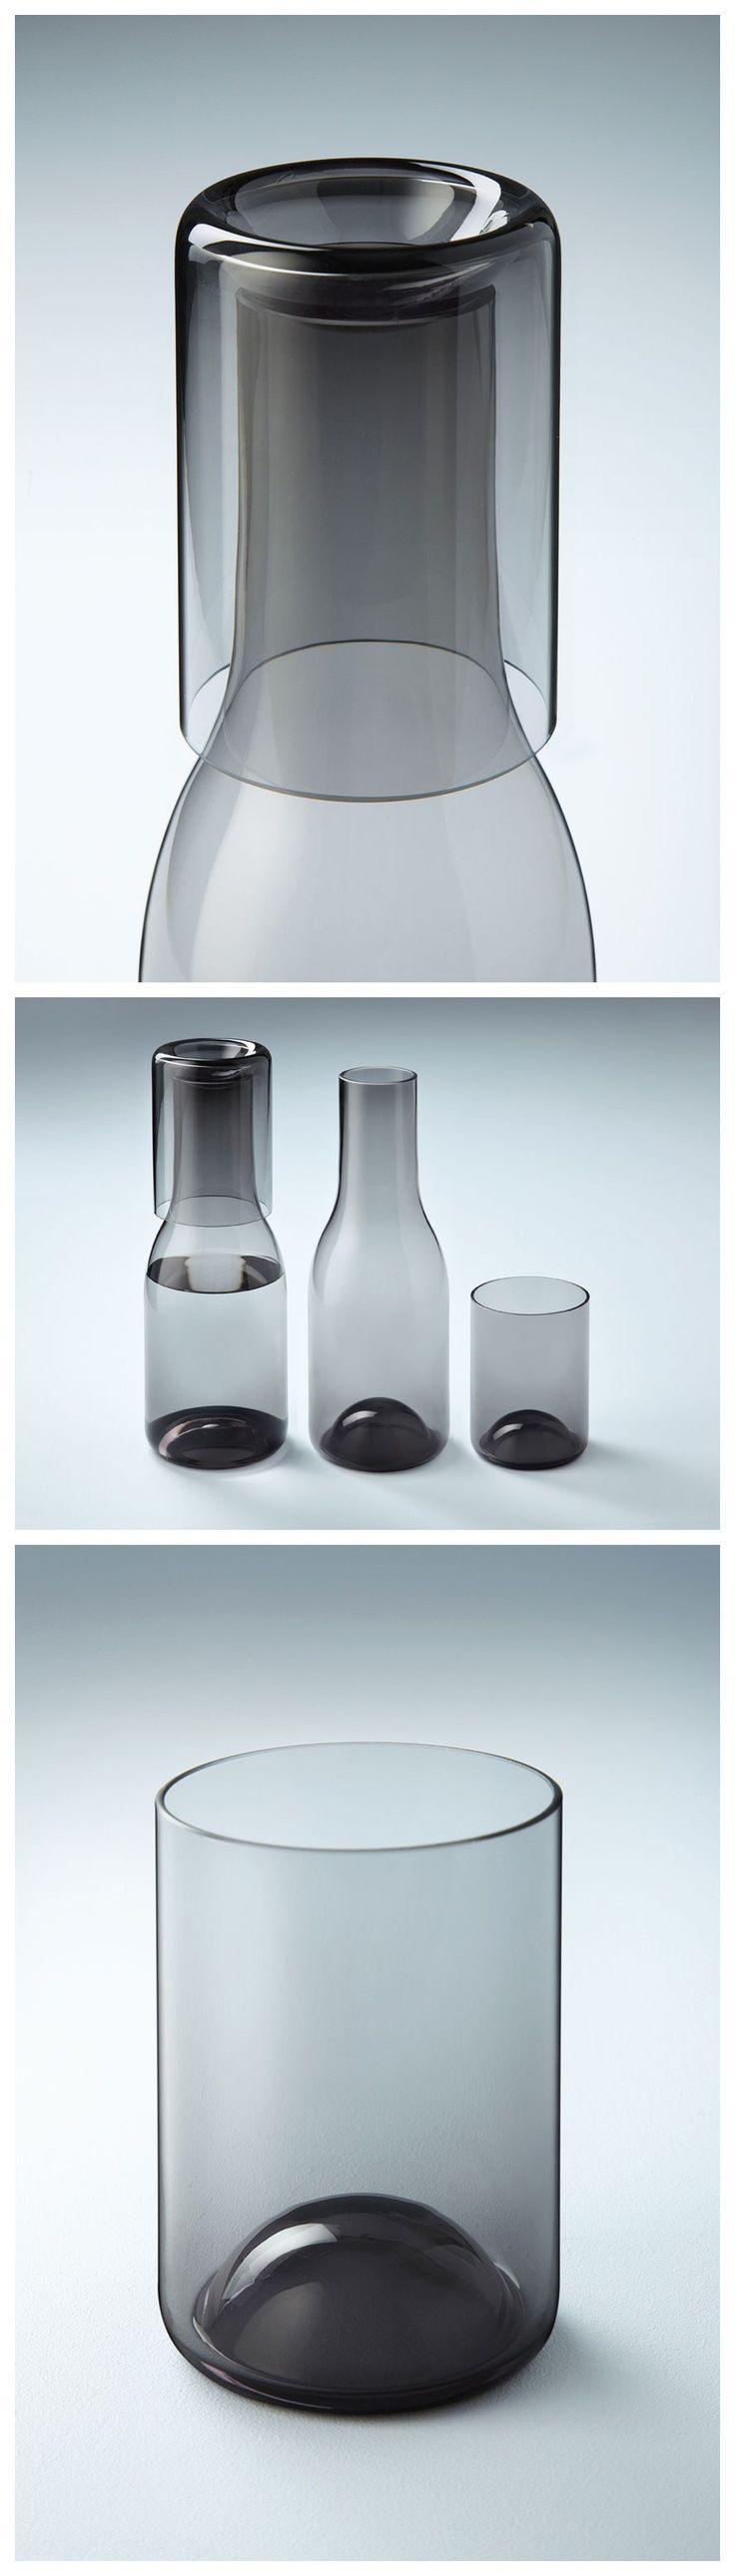 Punt Carafe by Two Create #minimal #minimalistgigi | Minimalist GiGi // GiGi